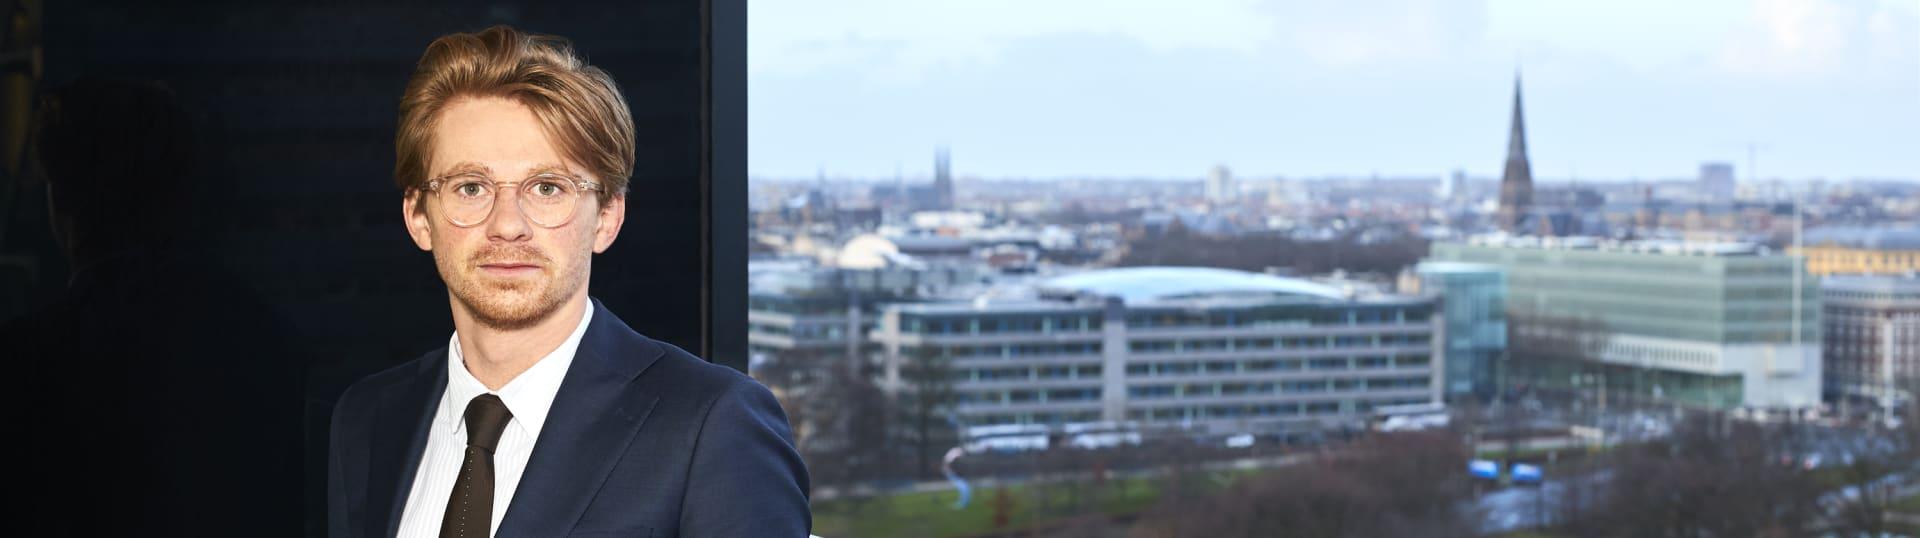 Lars Groeneveld, advocaat Pels Rijcken